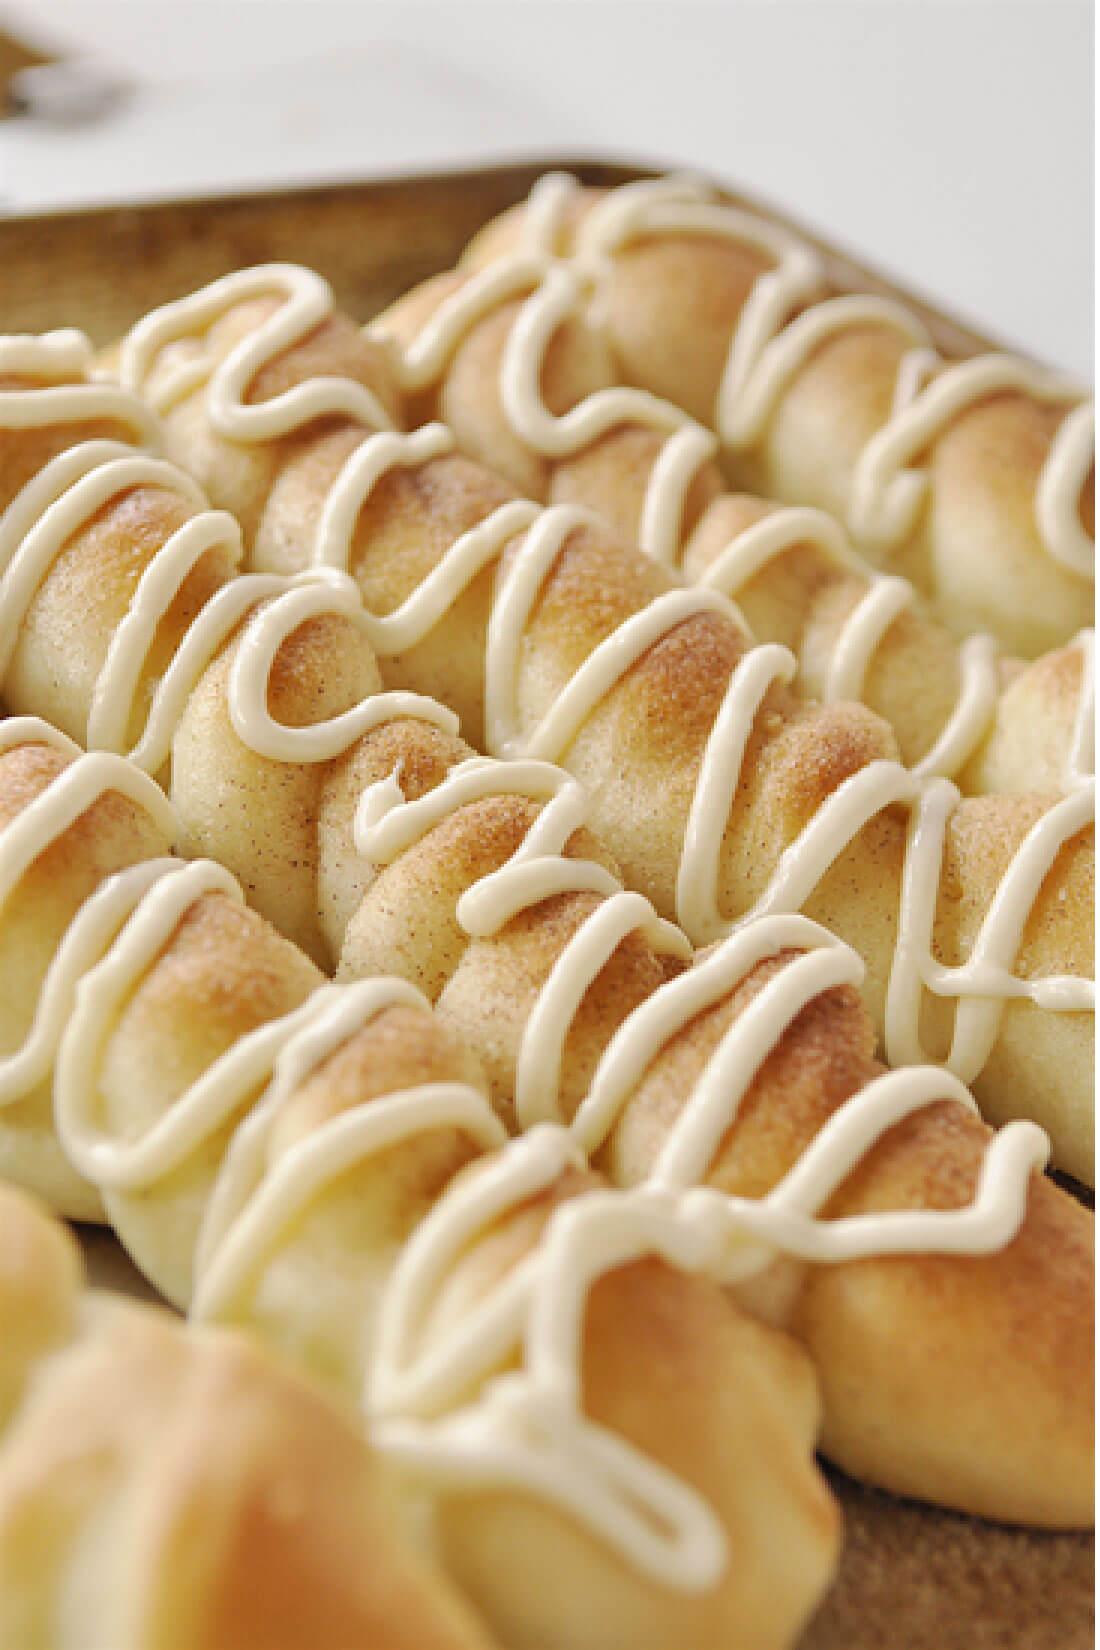 Cinnamon Sugar Breadsticks with Cream Cheese Frosting - the yummiest dessert to make.